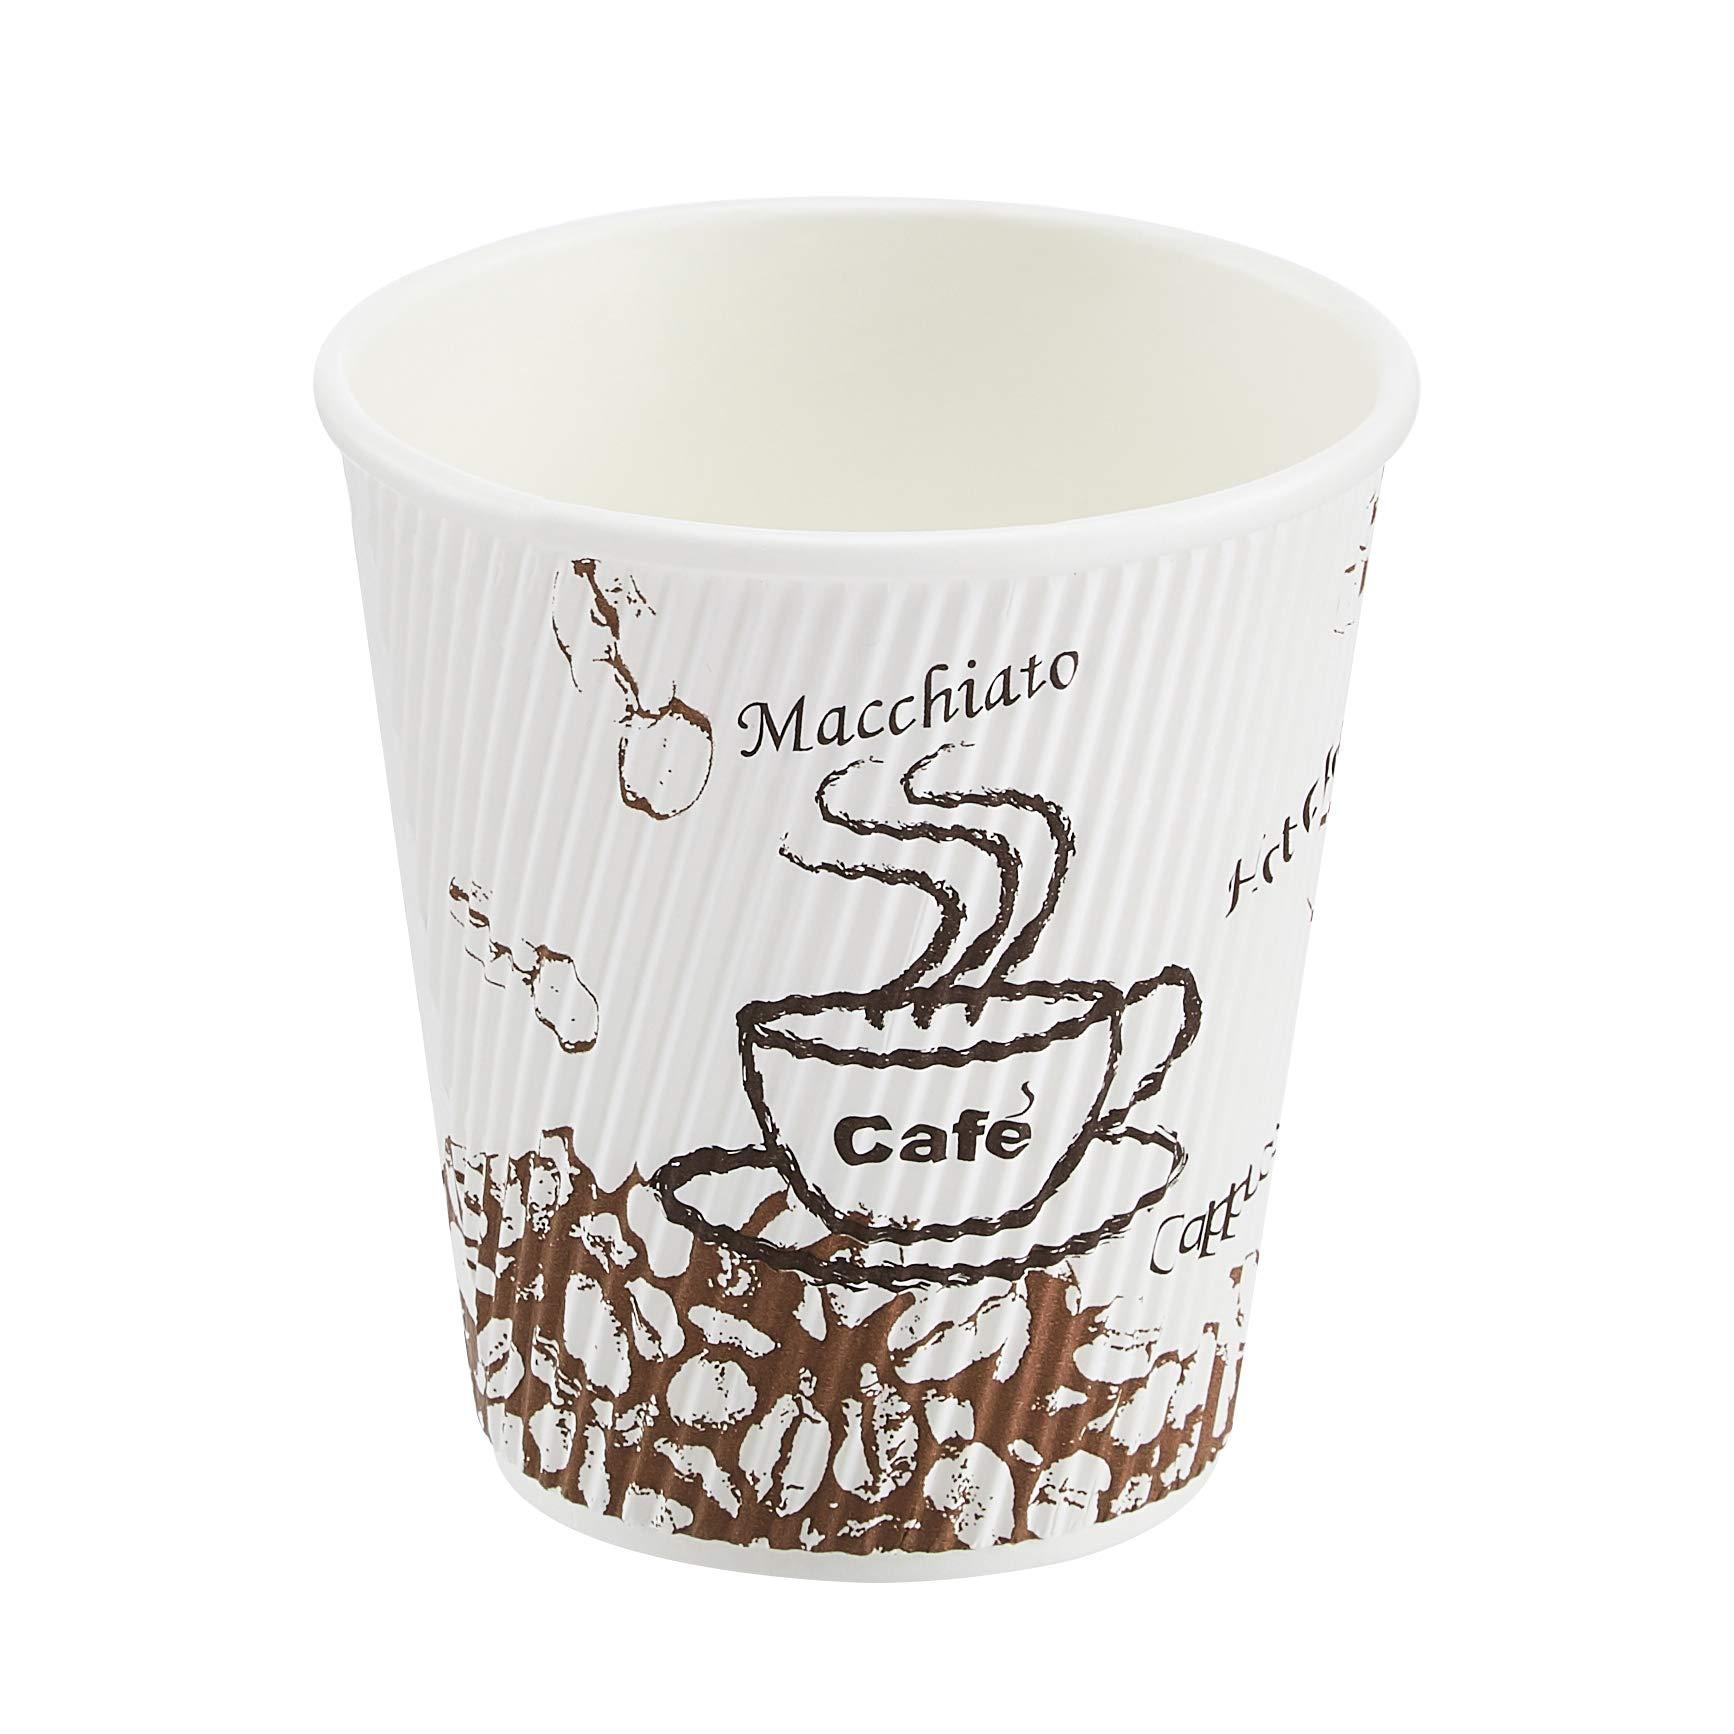 AmazonBasics Insulated Ripple Wall Hot Cup, Café Design, 10 oz, 240-Count